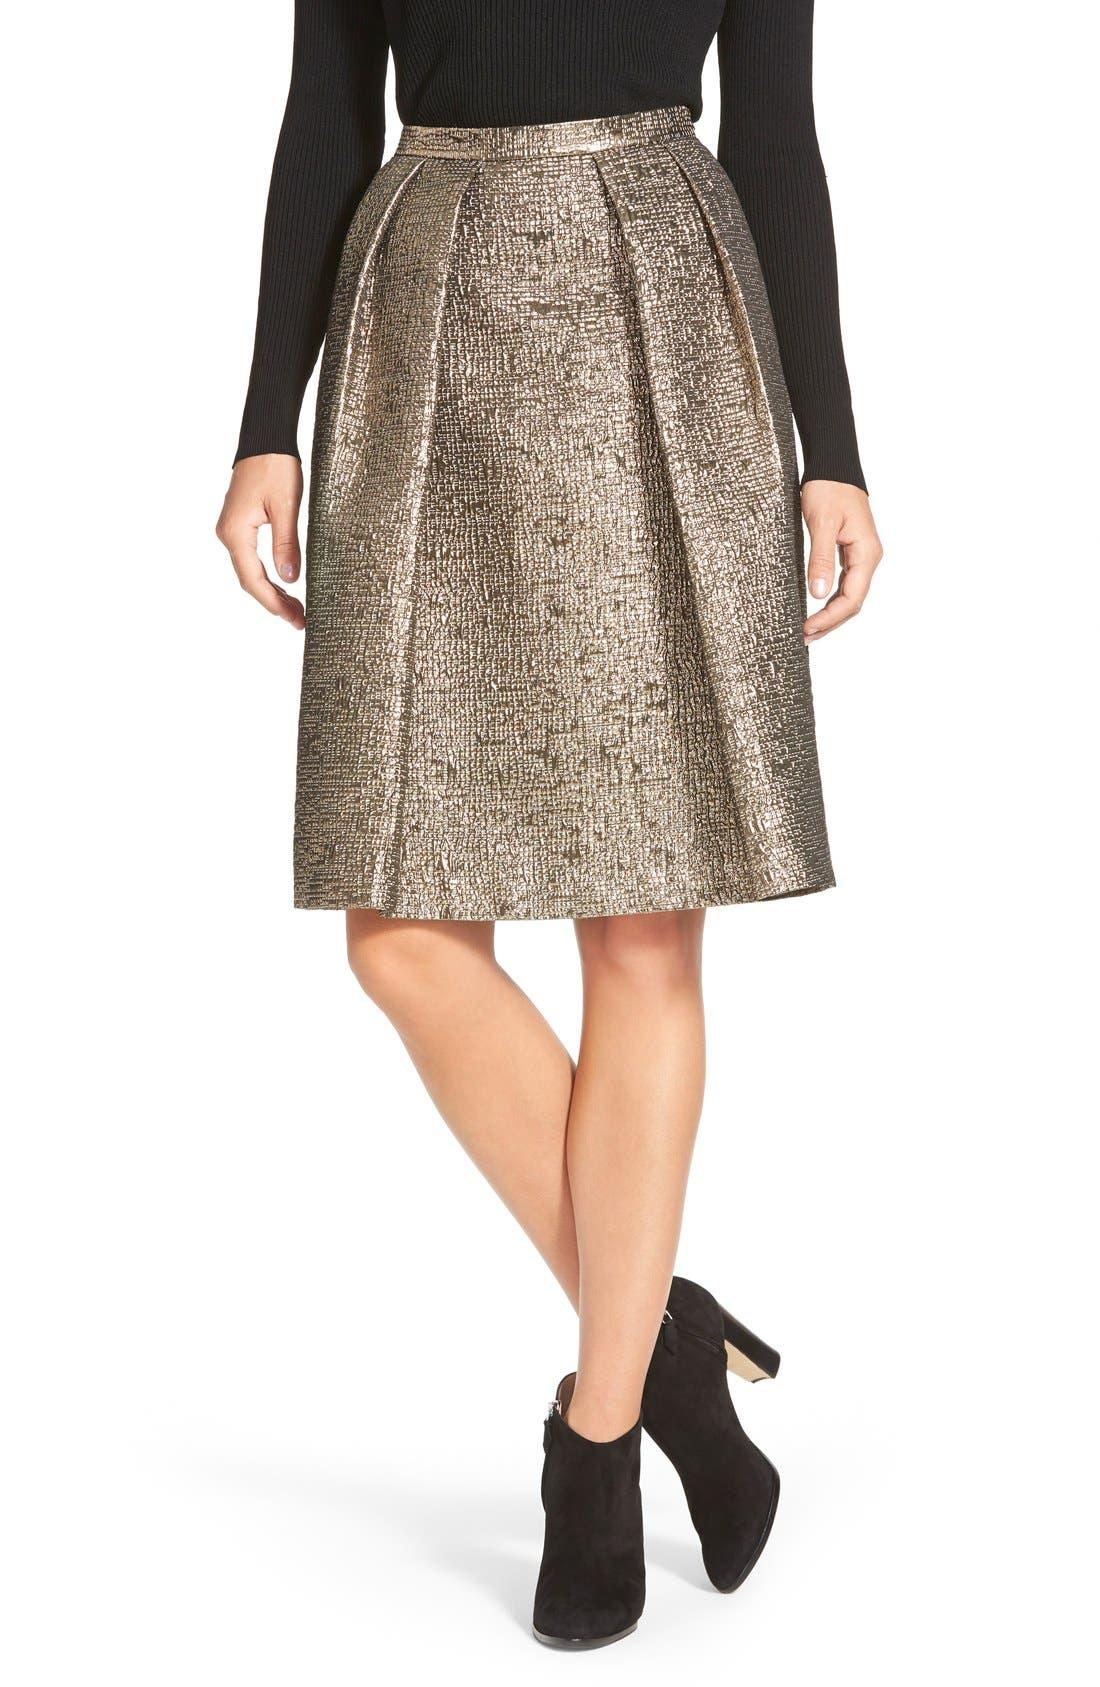 Alternate Image 1 Selected - Pink Tartan 'Tabitha' Metallic Cloqué Skirt